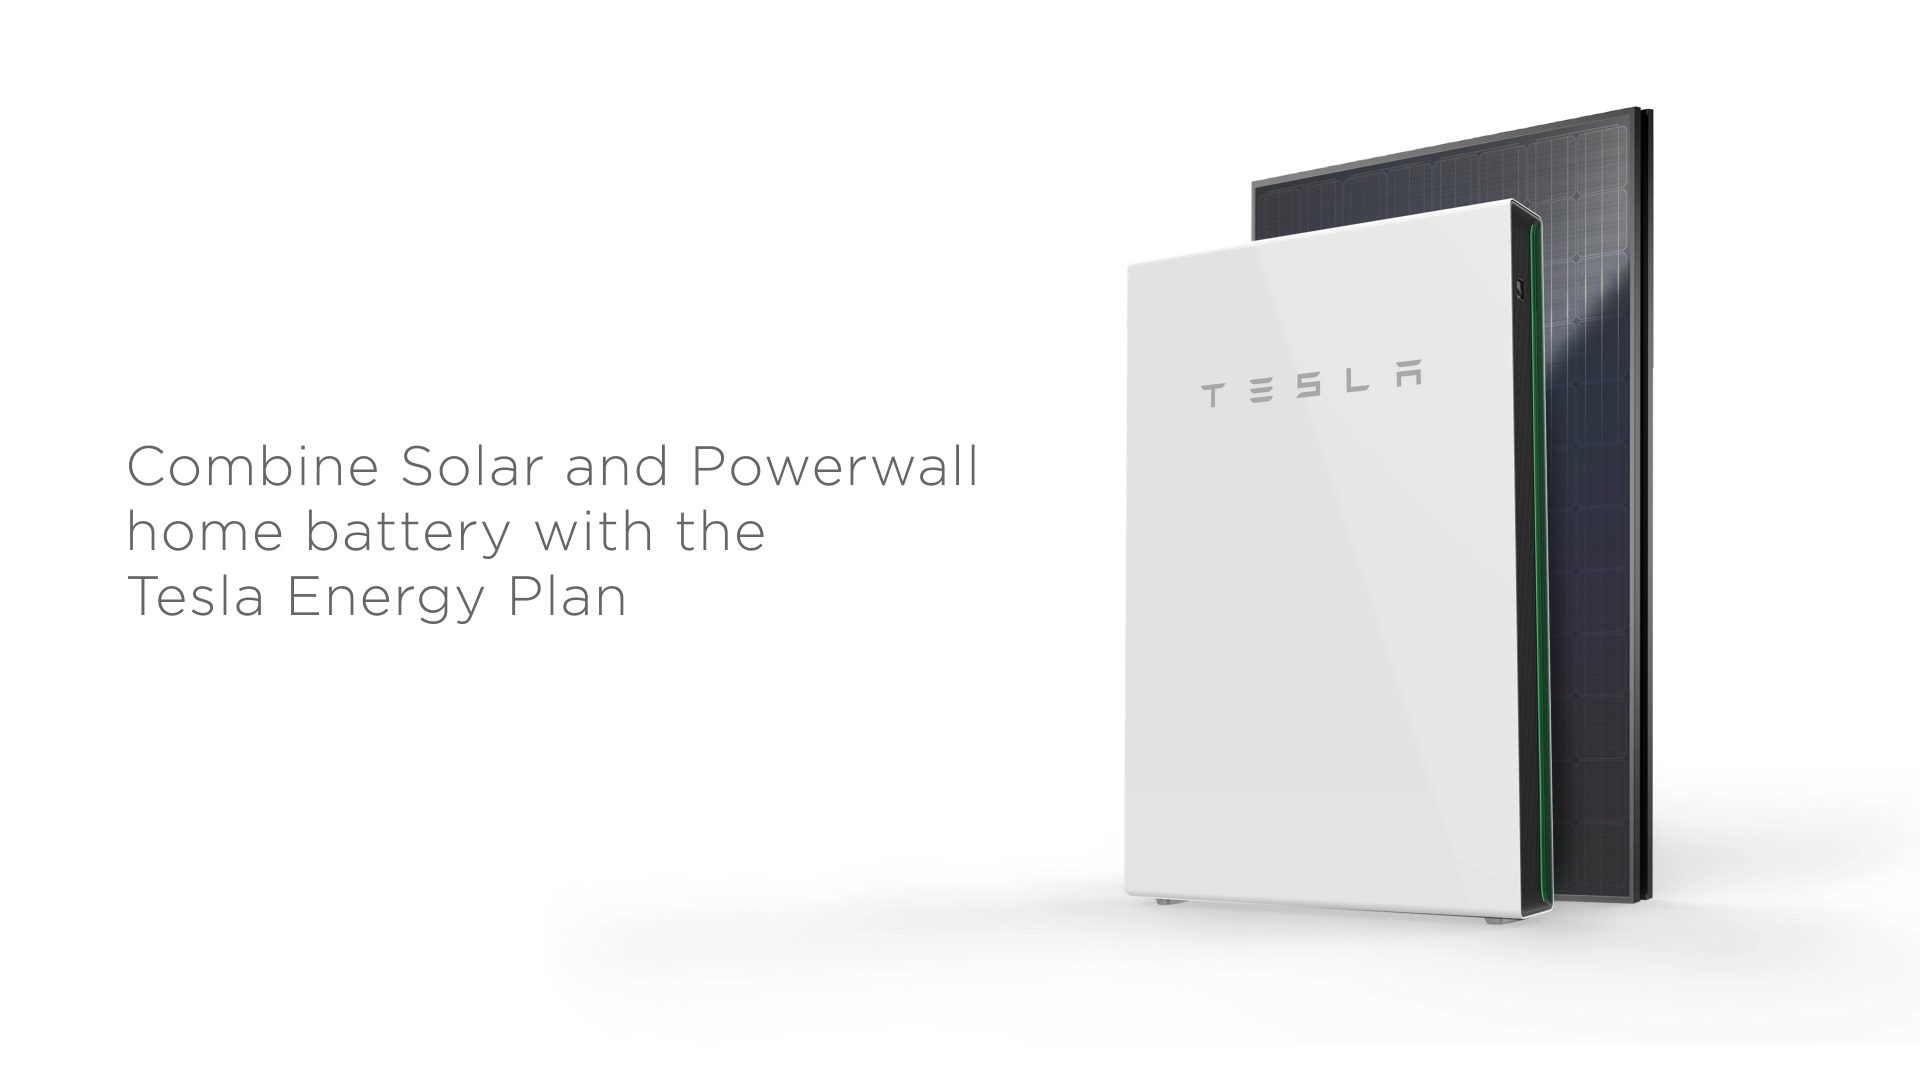 Tesla Energy Plan video